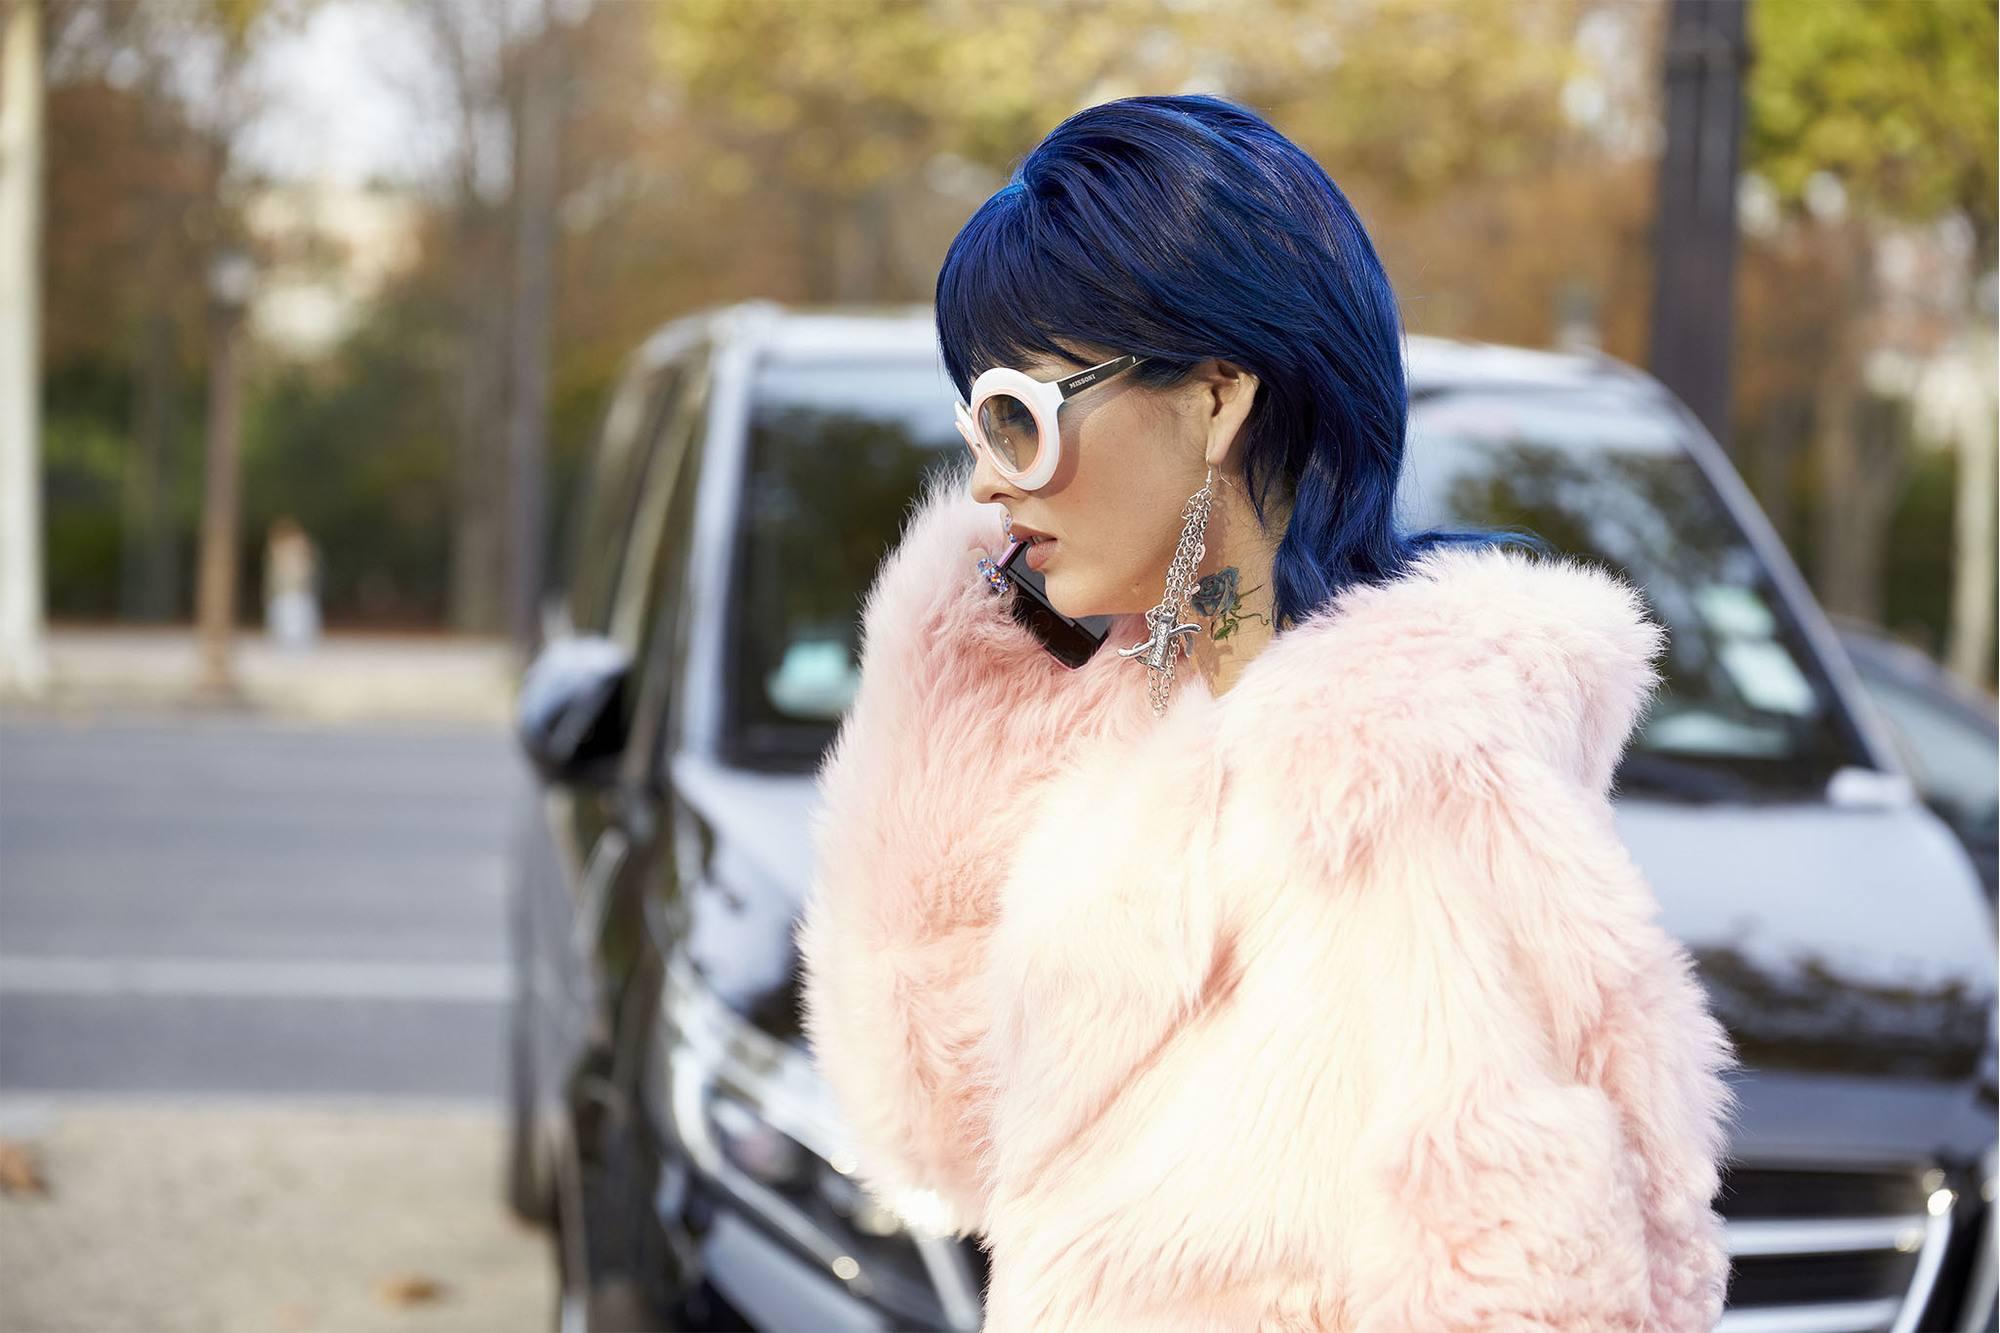 mujer con pelo azul